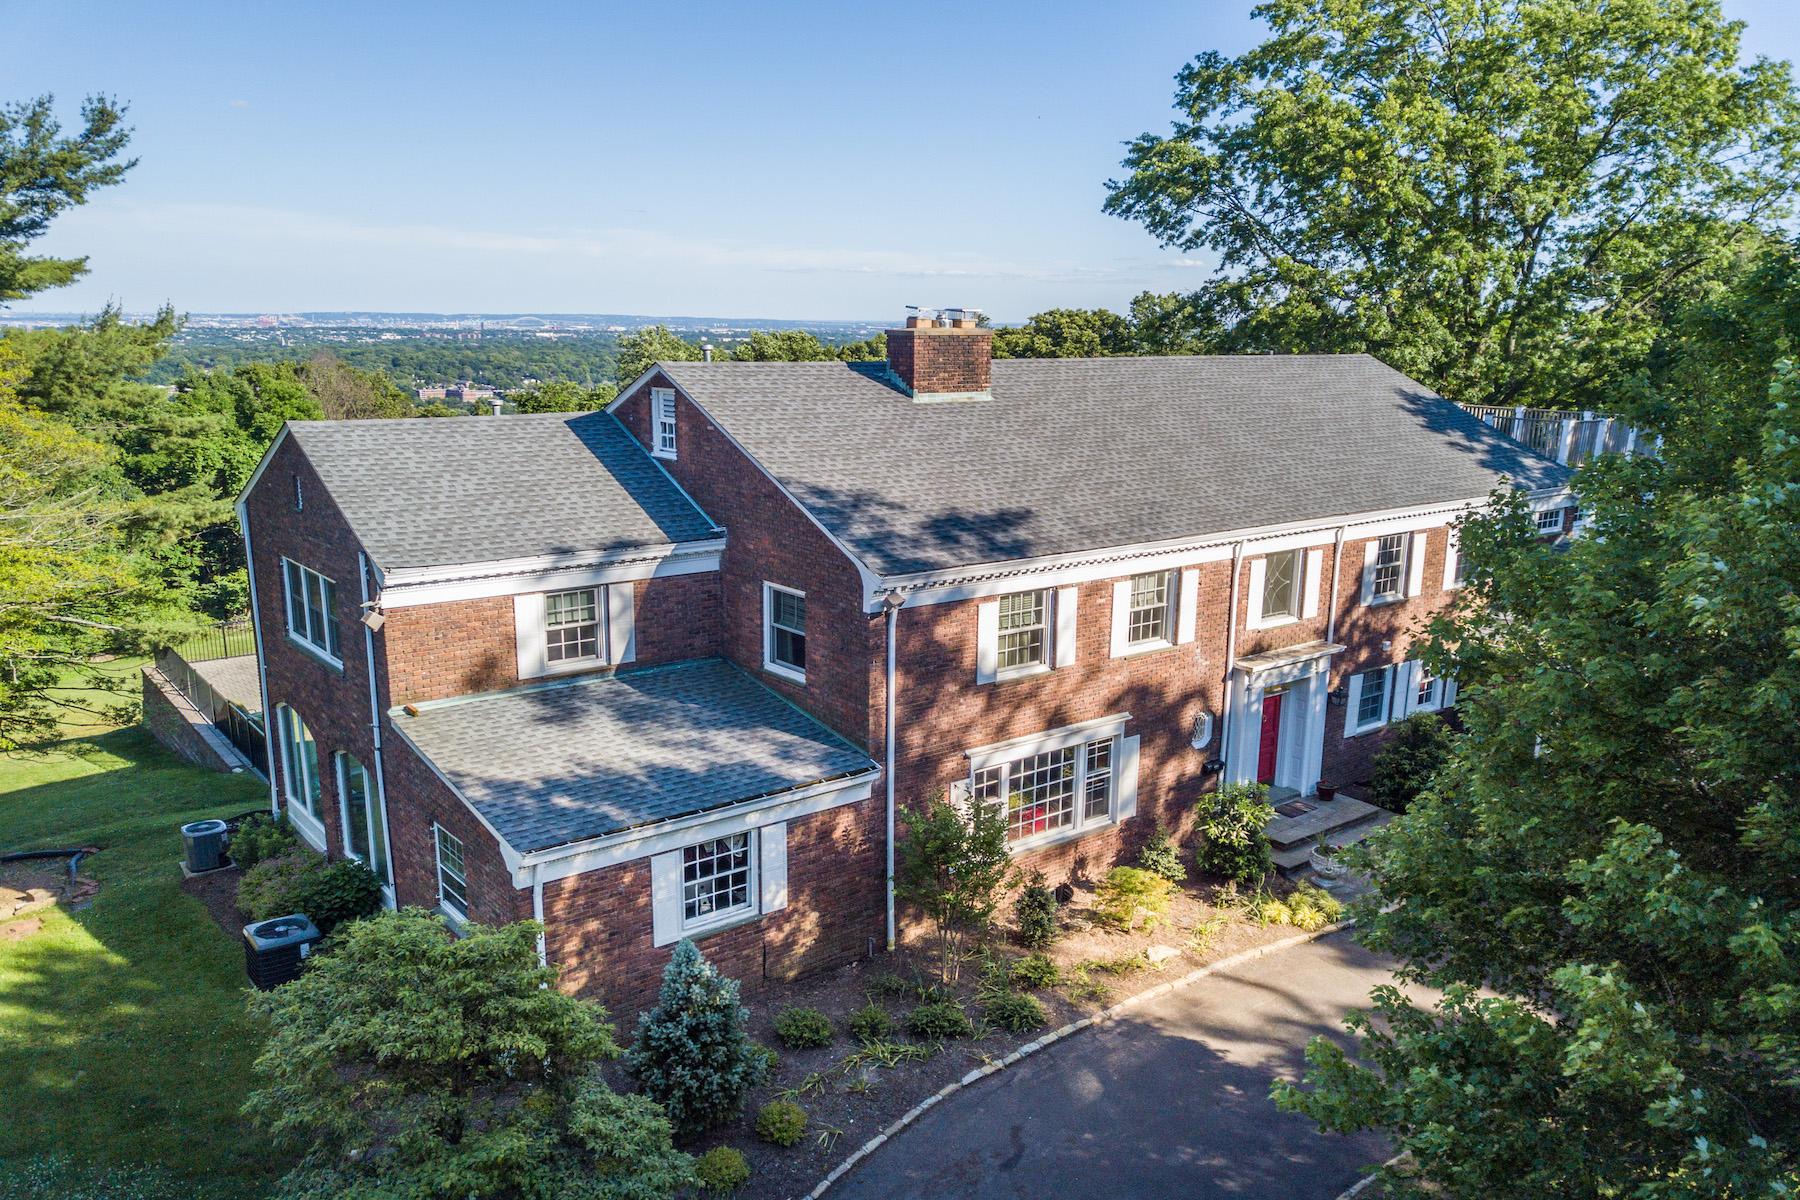 Single Family Homes için Satış at One-of-a-Kind Georgian Colonial 70 Rock Spring Road, West Orange, New Jersey 07052 Amerika Birleşik Devletleri